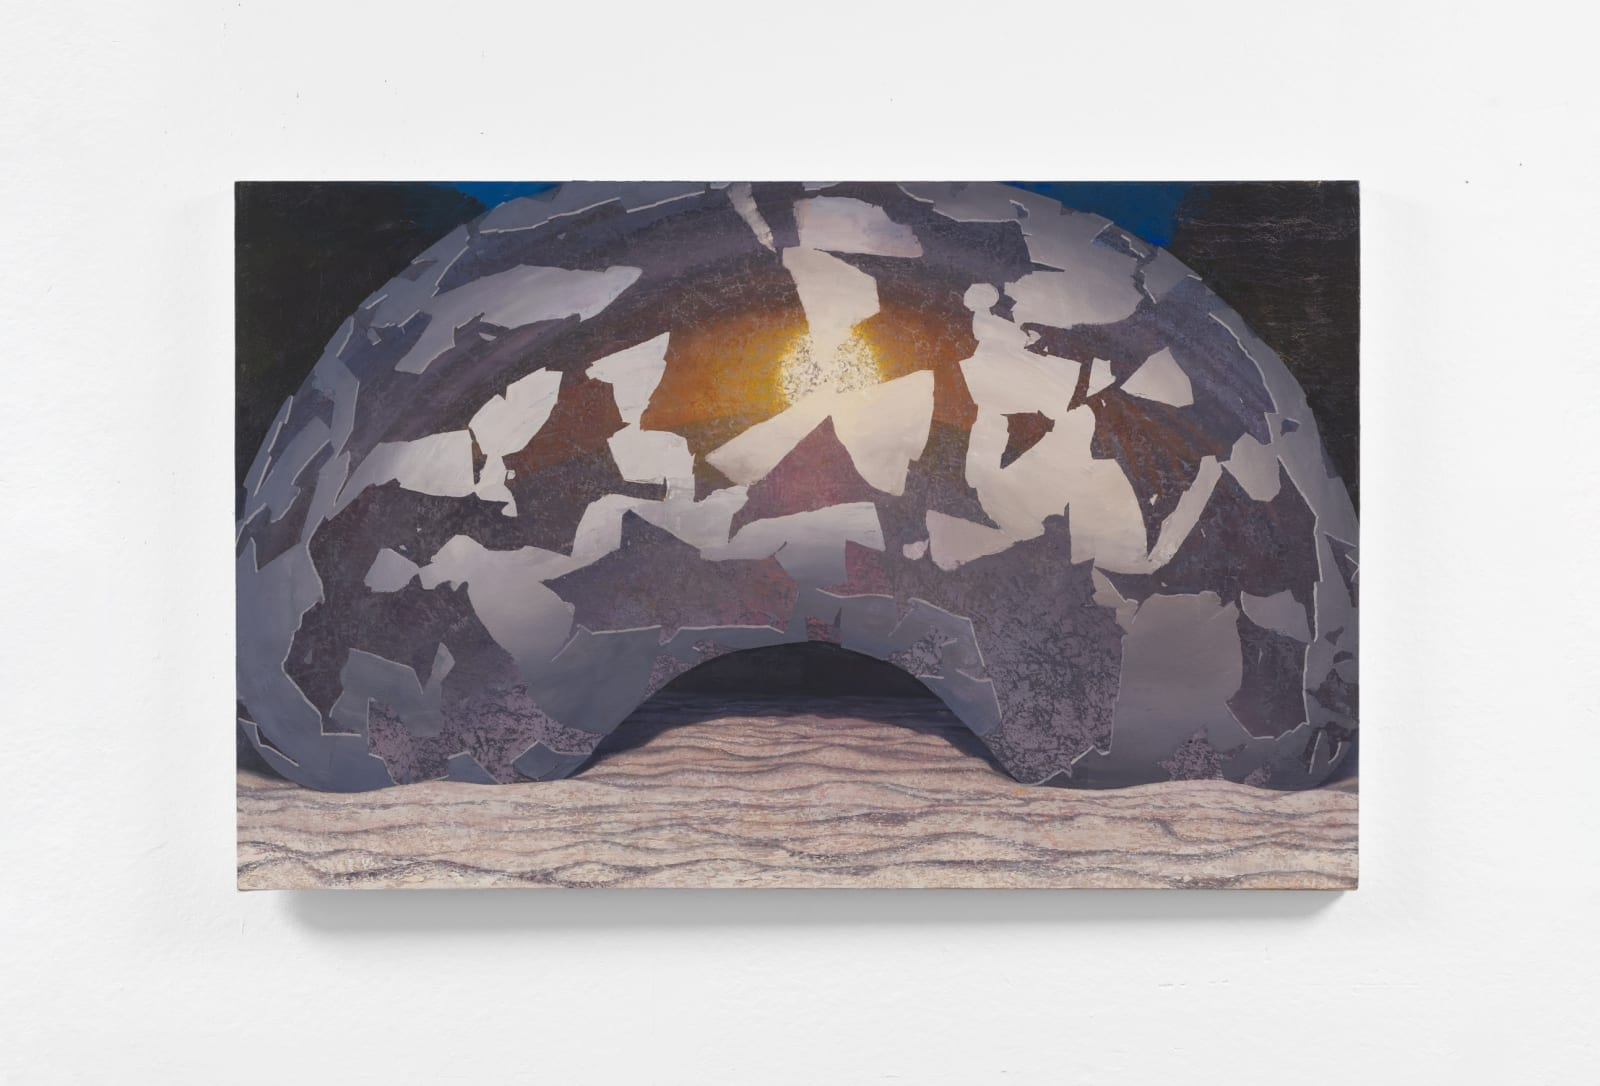 Daniel Dove Dusk, 2018 Oil on canvas 34 x 54 in 86.4 x 137.2 cm